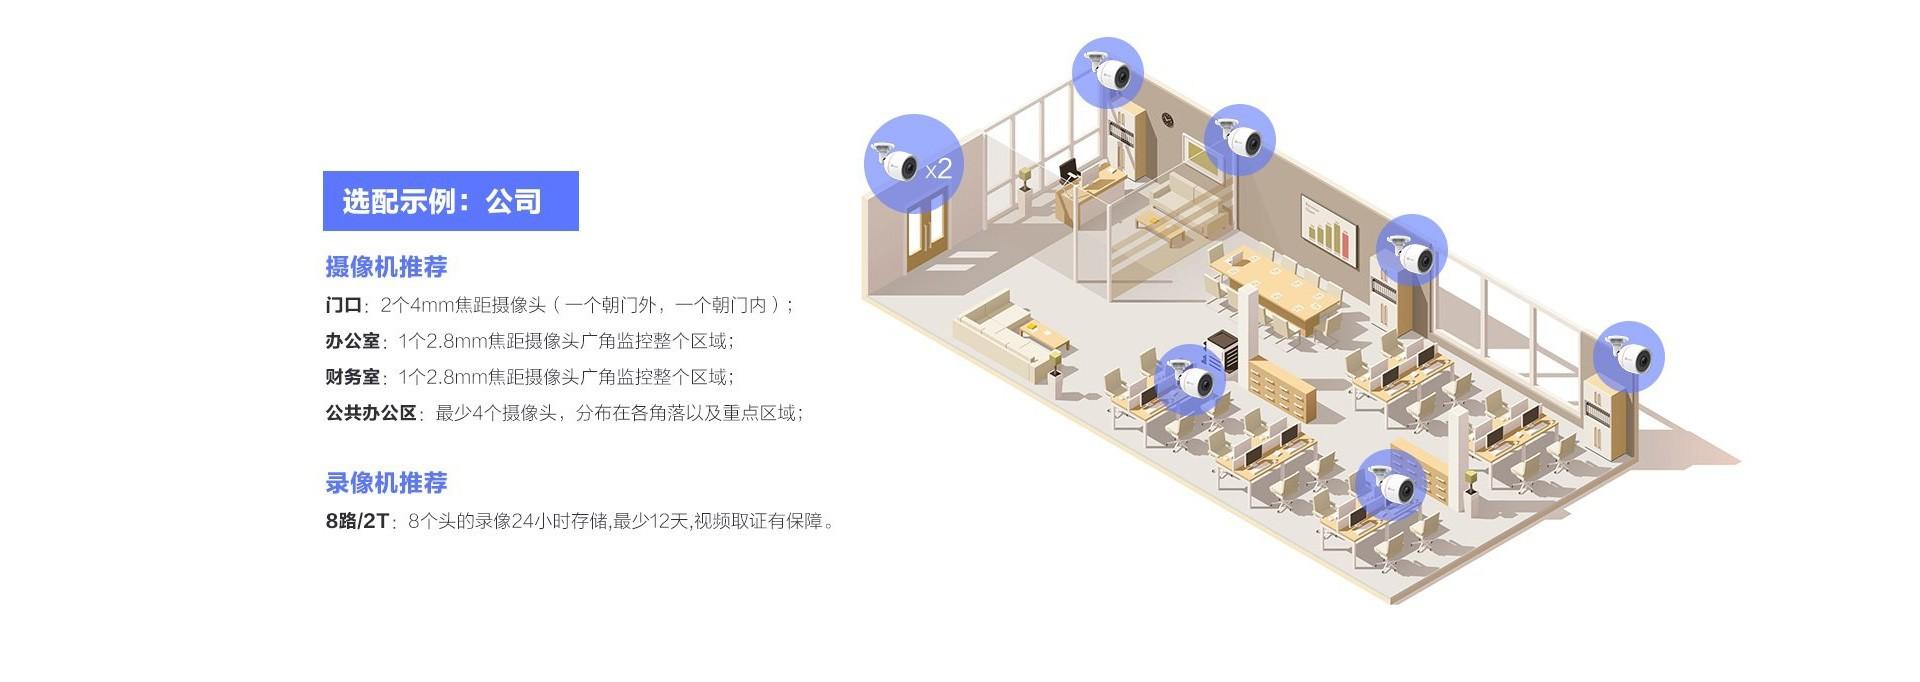 C3W+X5S套装-web_24.jpg